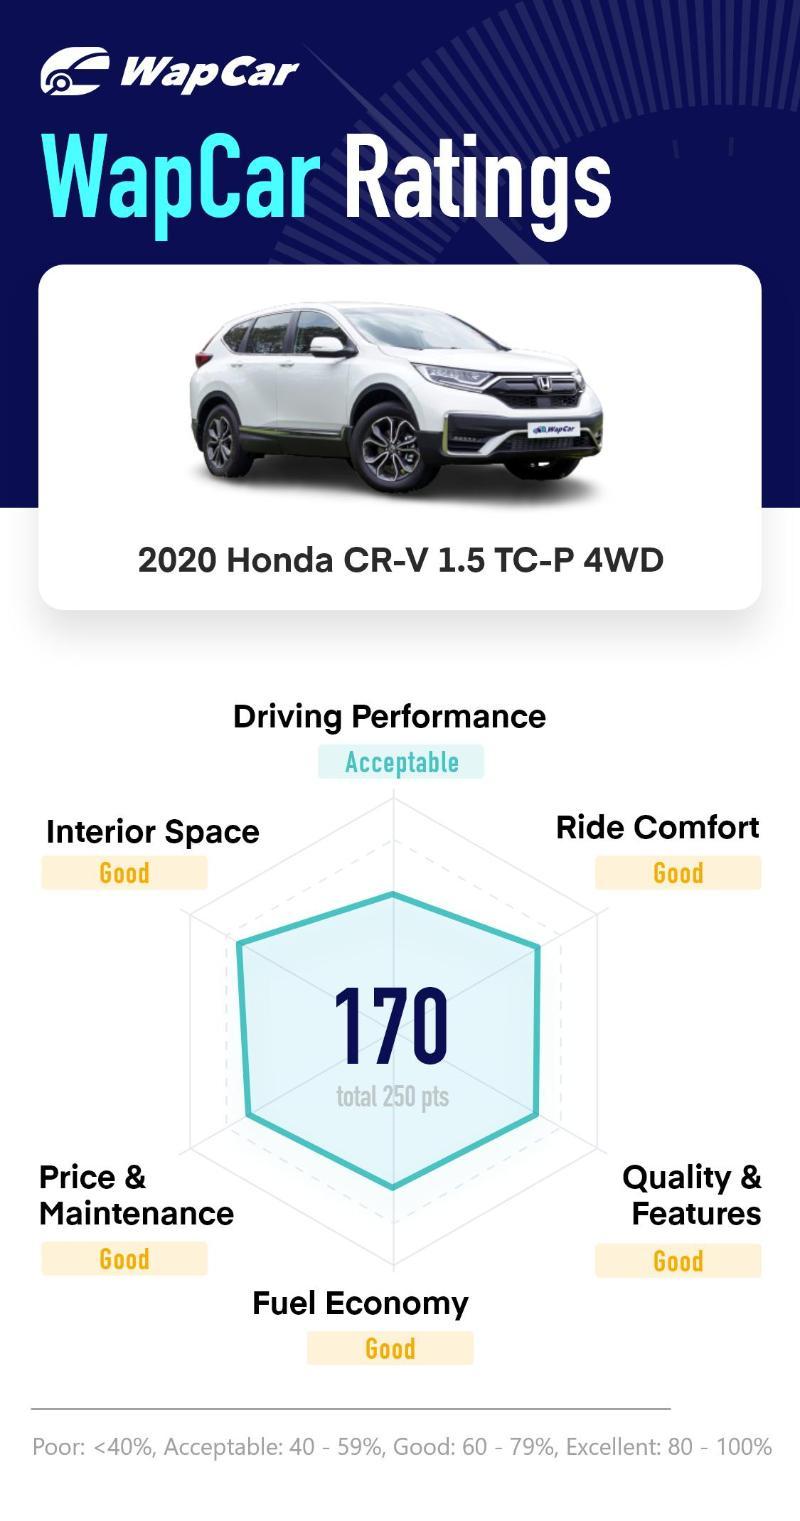 Ratings: 2020 Honda CR-V 1.5 TC-P 4WD - Still an excellent all-rounder 02